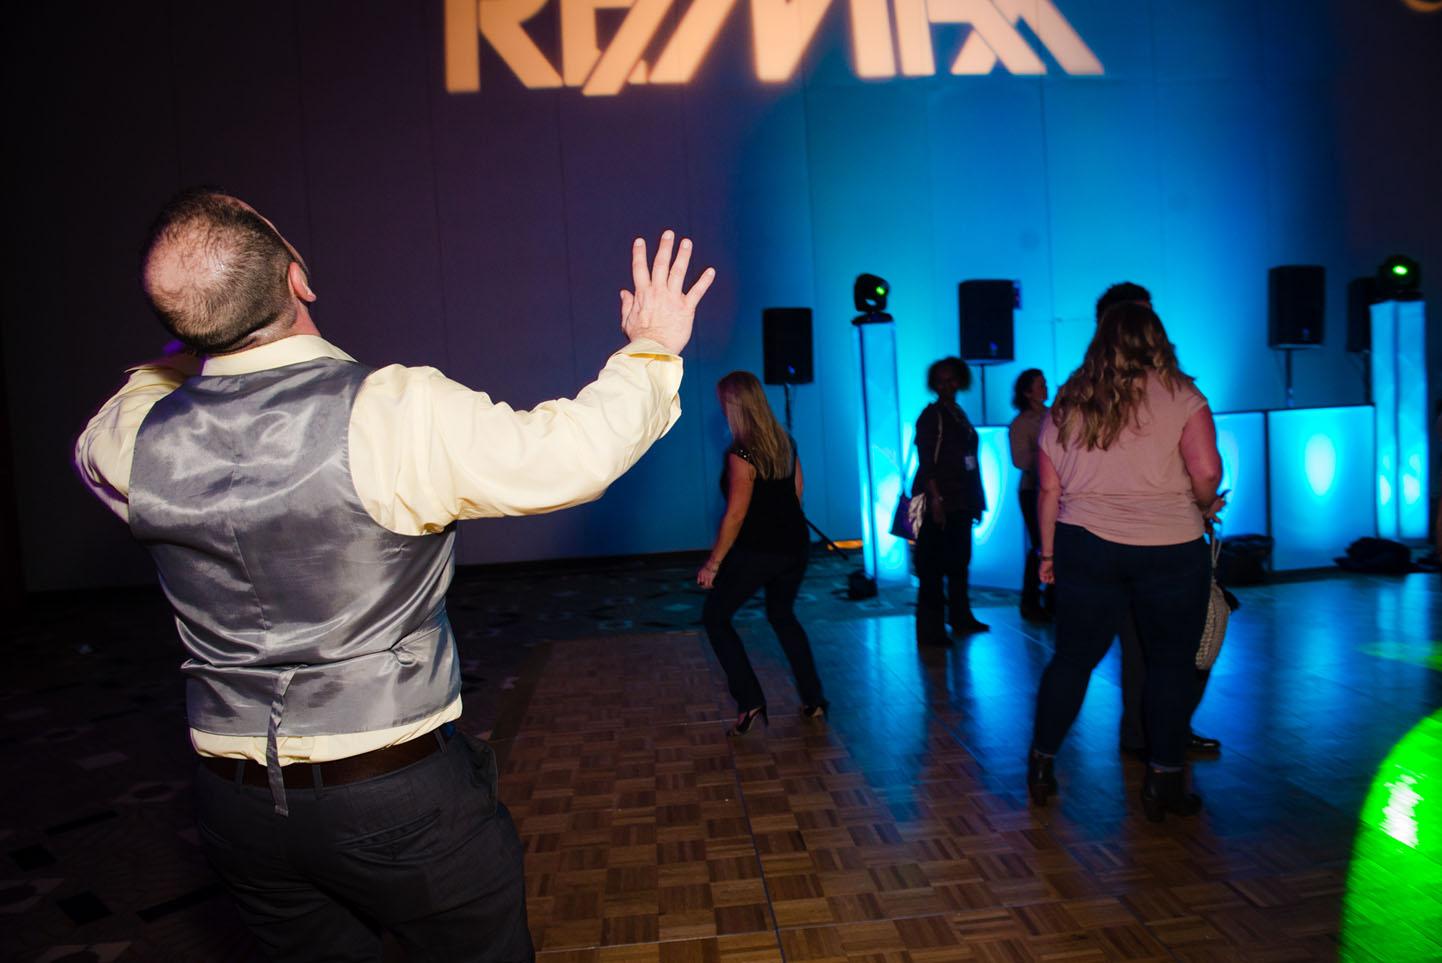 2015-12-09 ReMax Corpoarte Event - The Borgata - Atlantic City NJ - Photo Sesh - 2015-5302.jpg